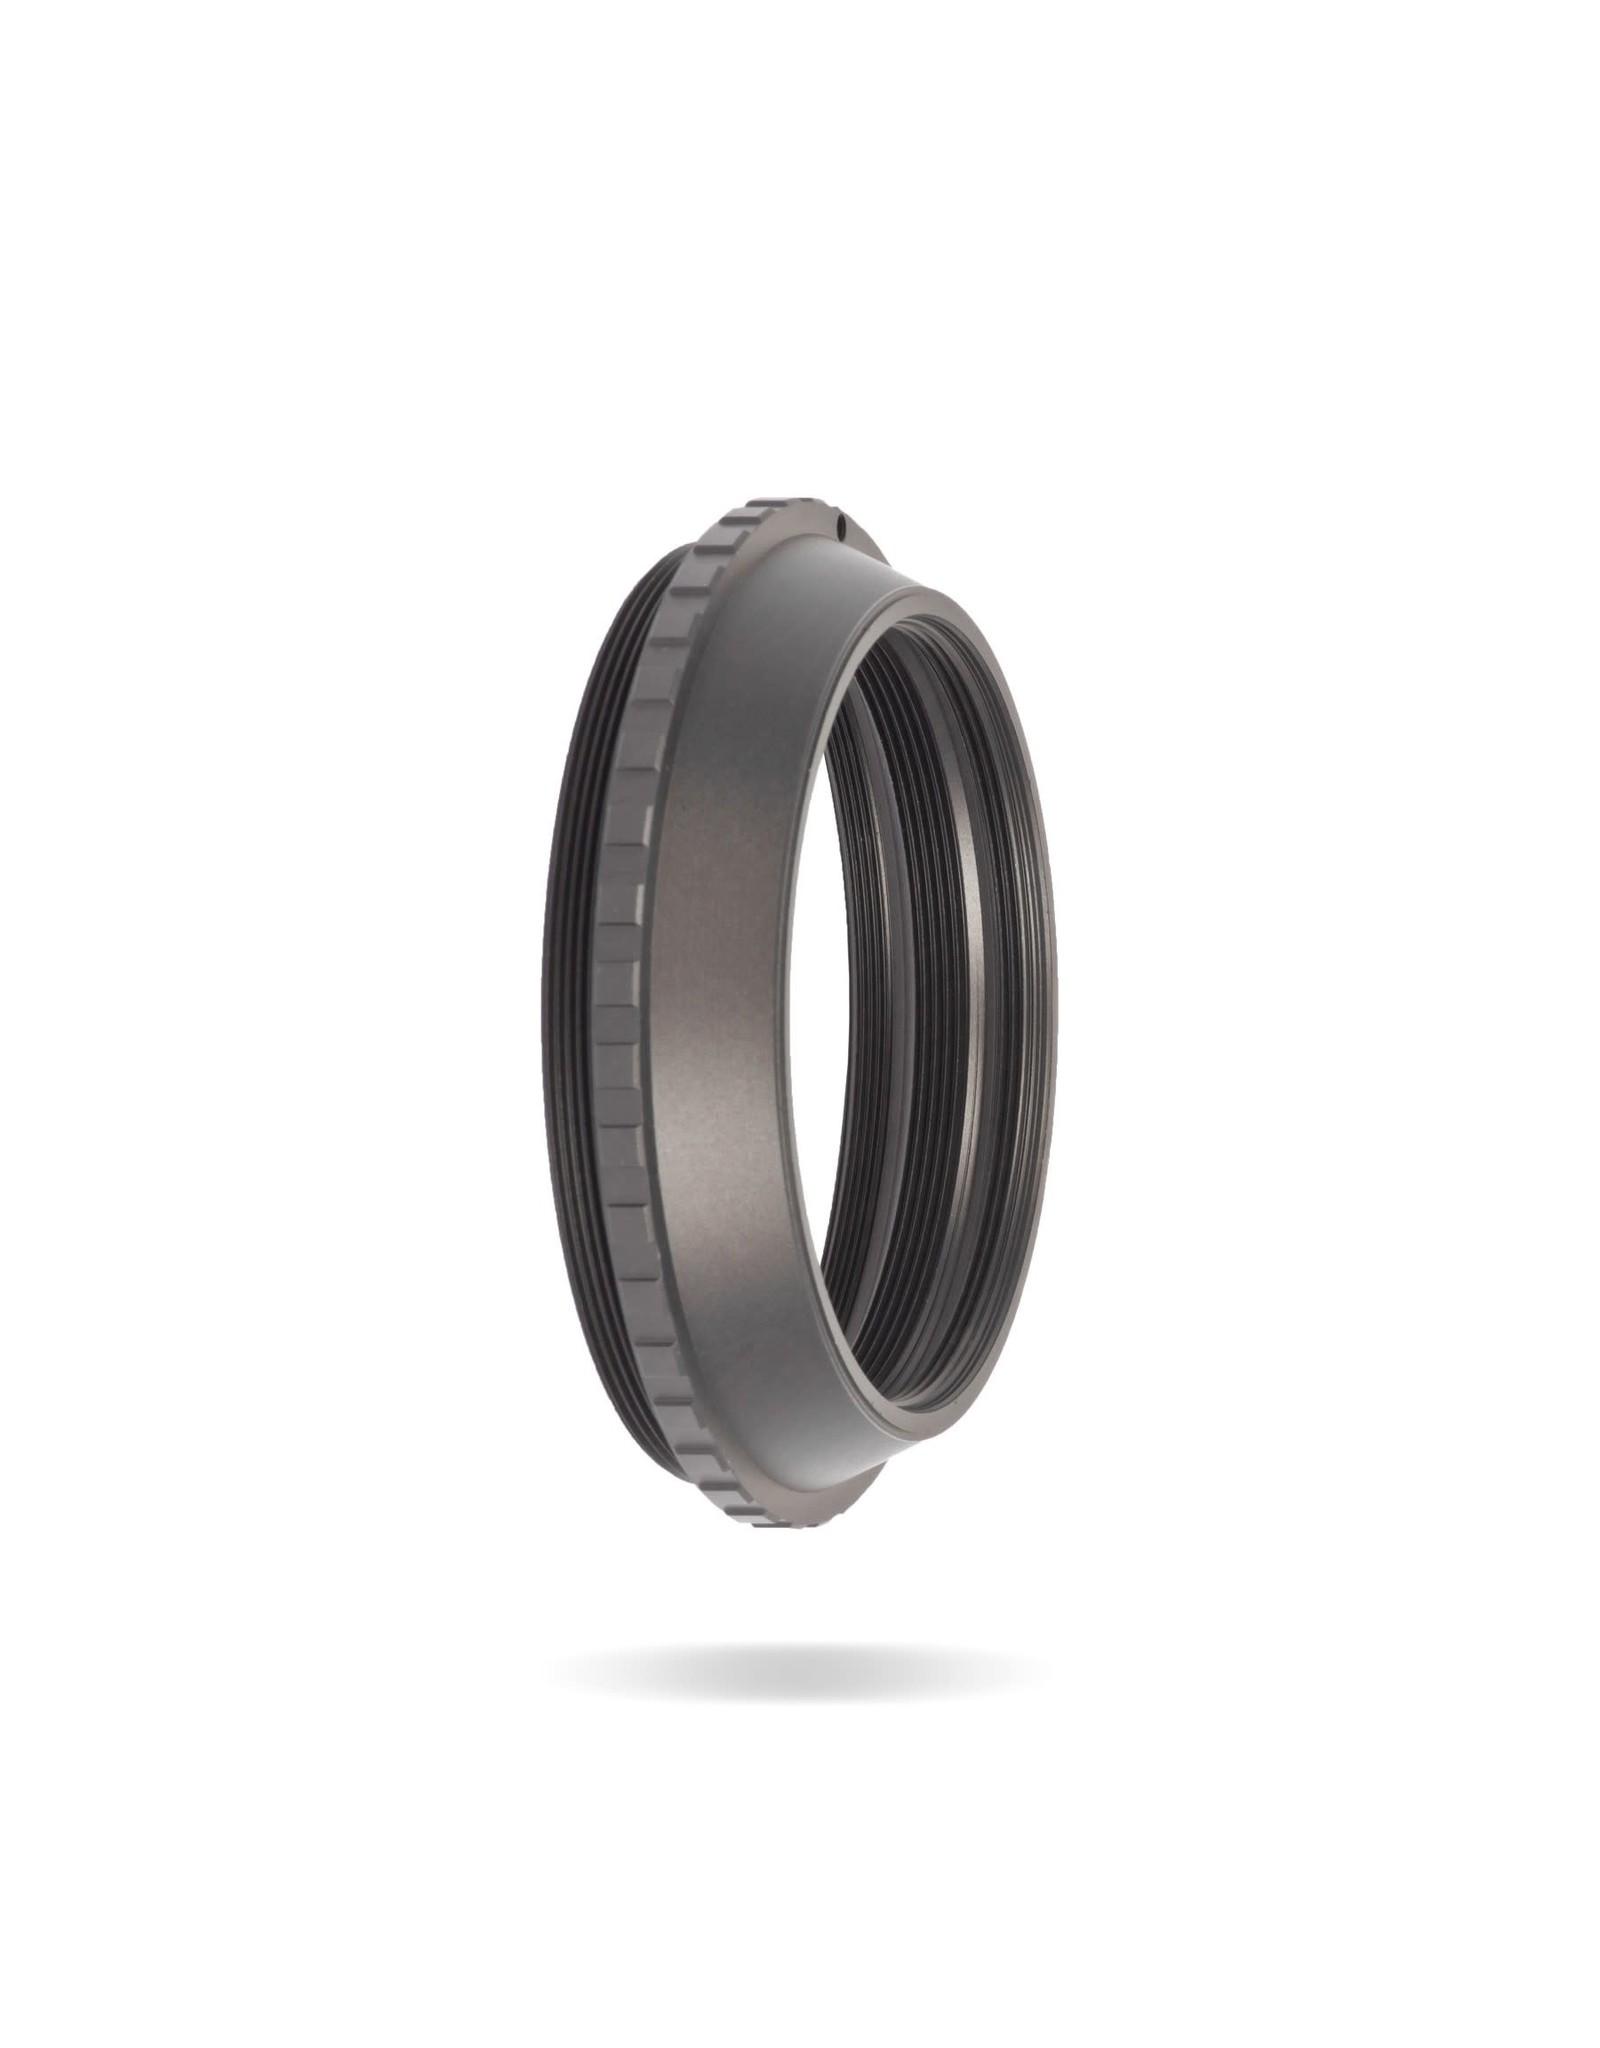 "Baader Planetarium Baader Adapter M82/M68 Reducer Ring for Baader 3"" Hyperion Focuser"